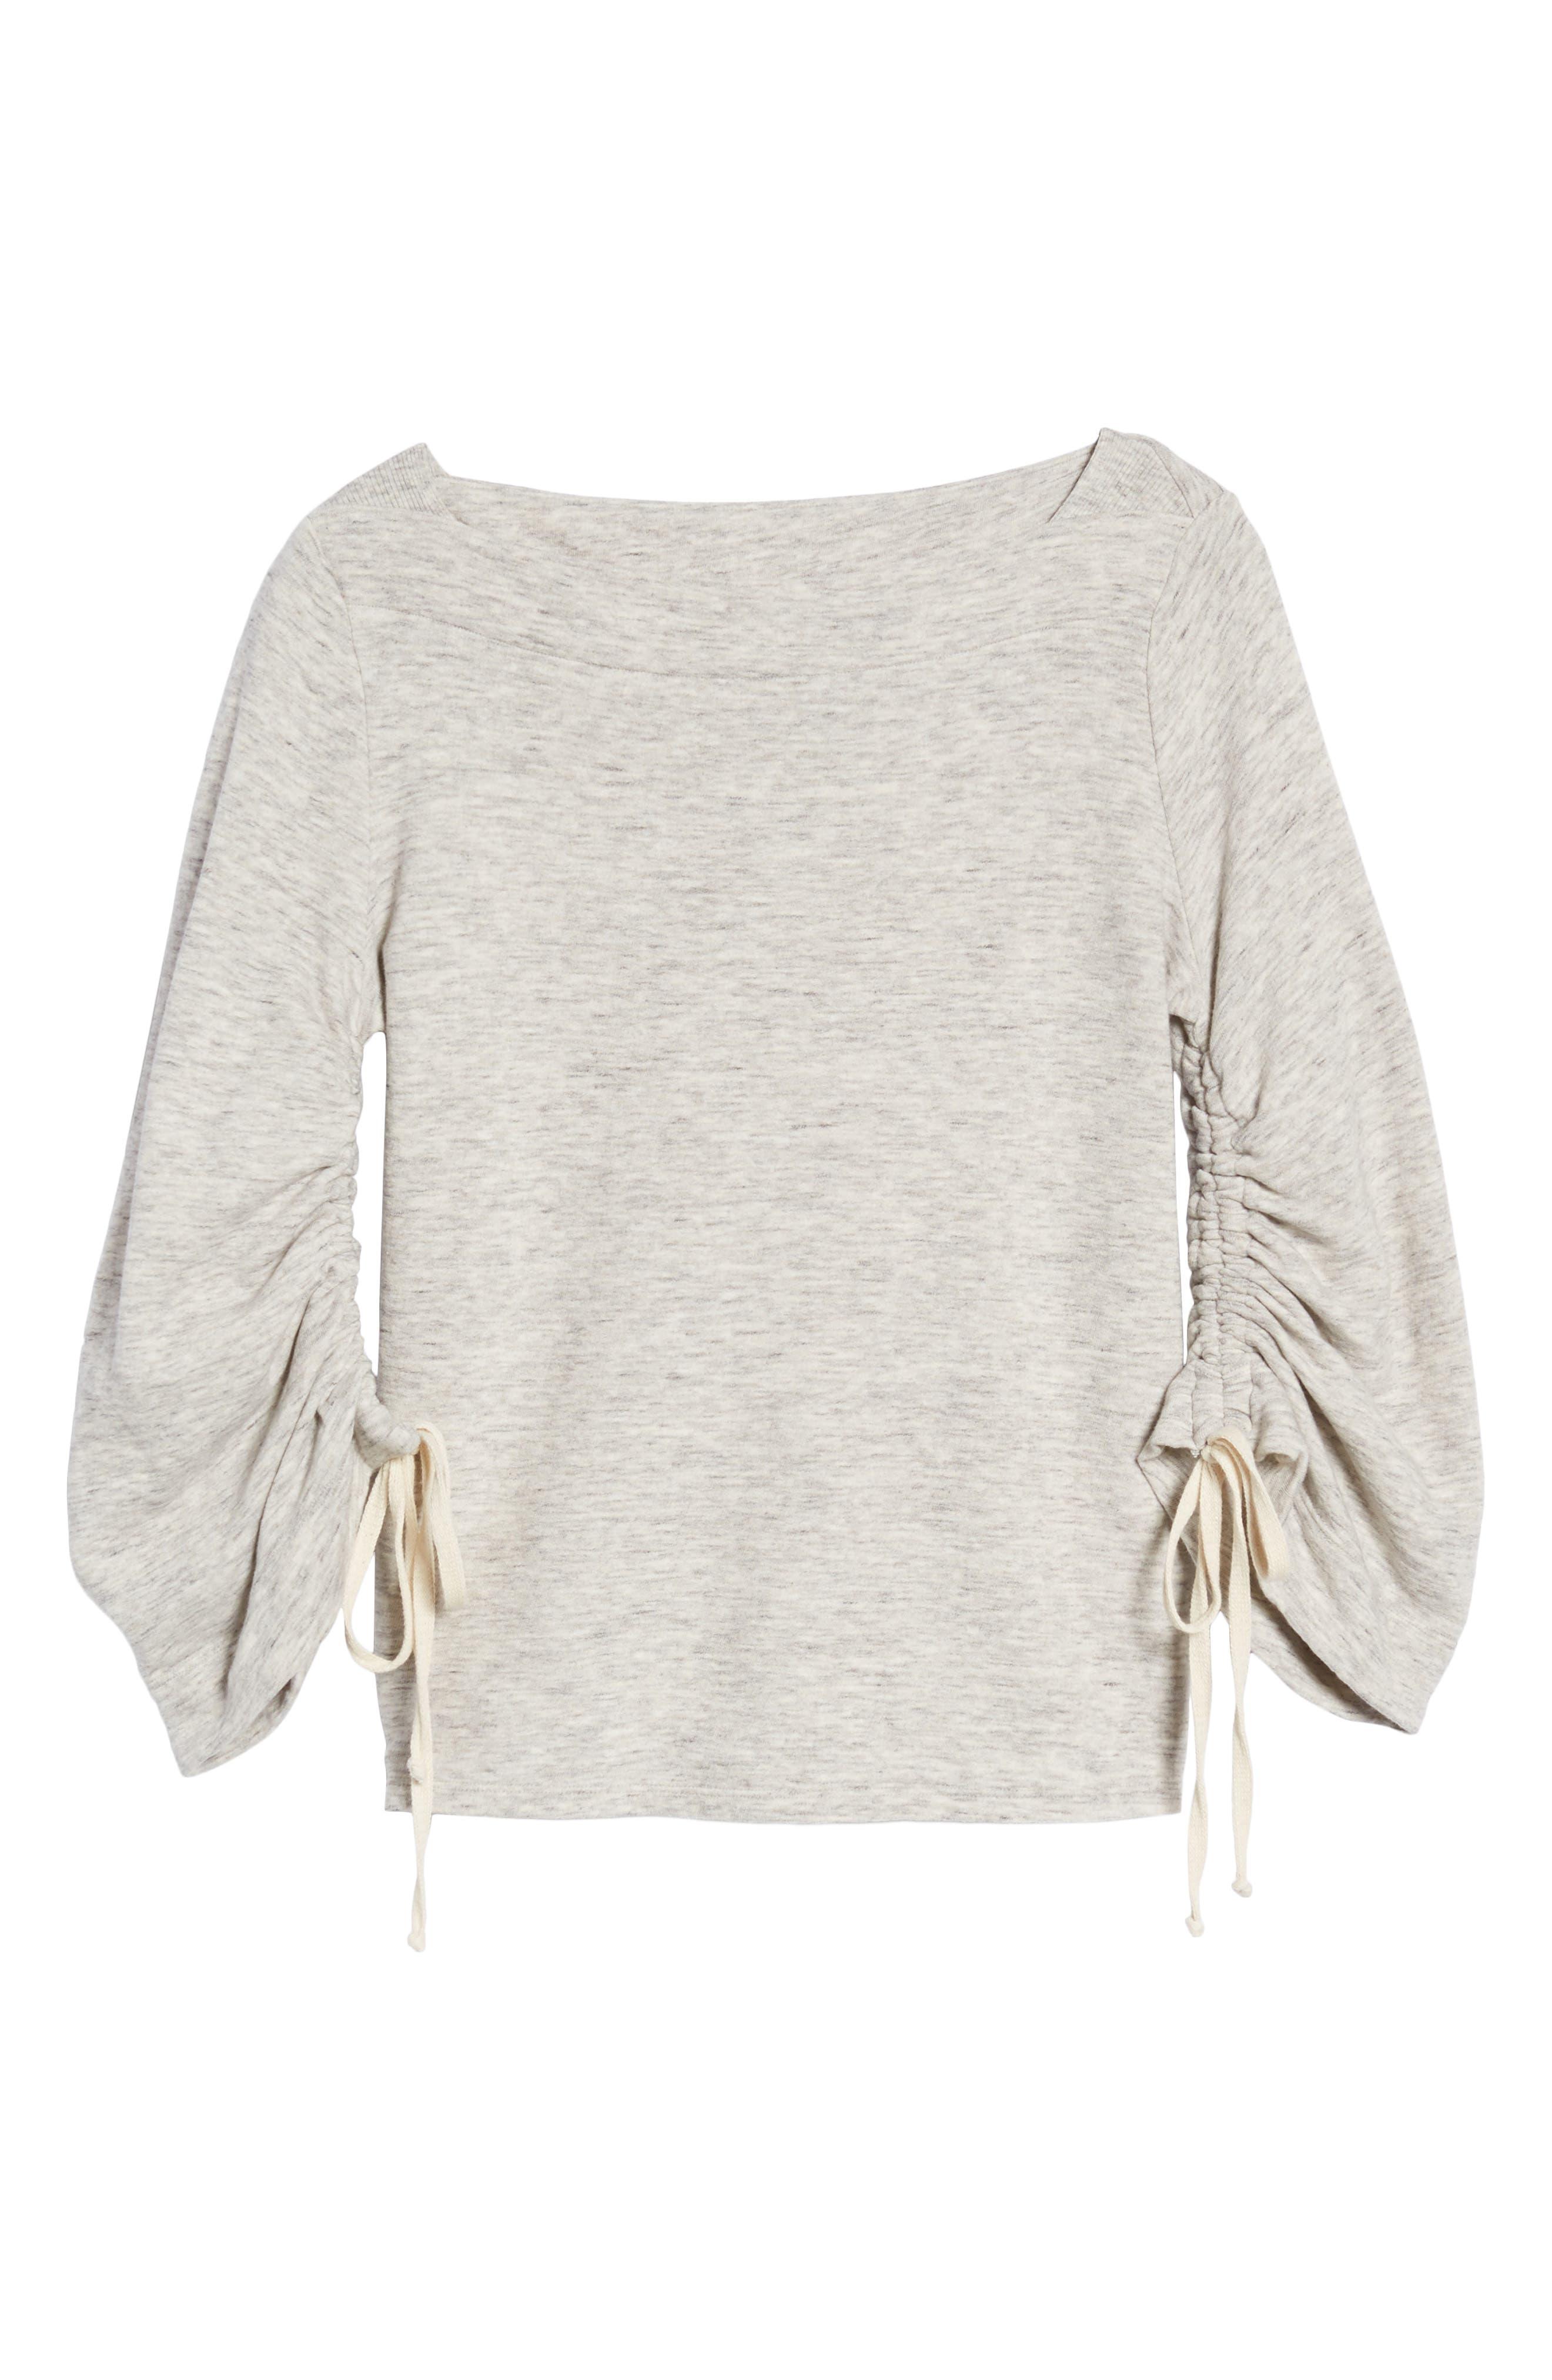 Ruched Sleeve Sweatshirt,                             Alternate thumbnail 6, color,